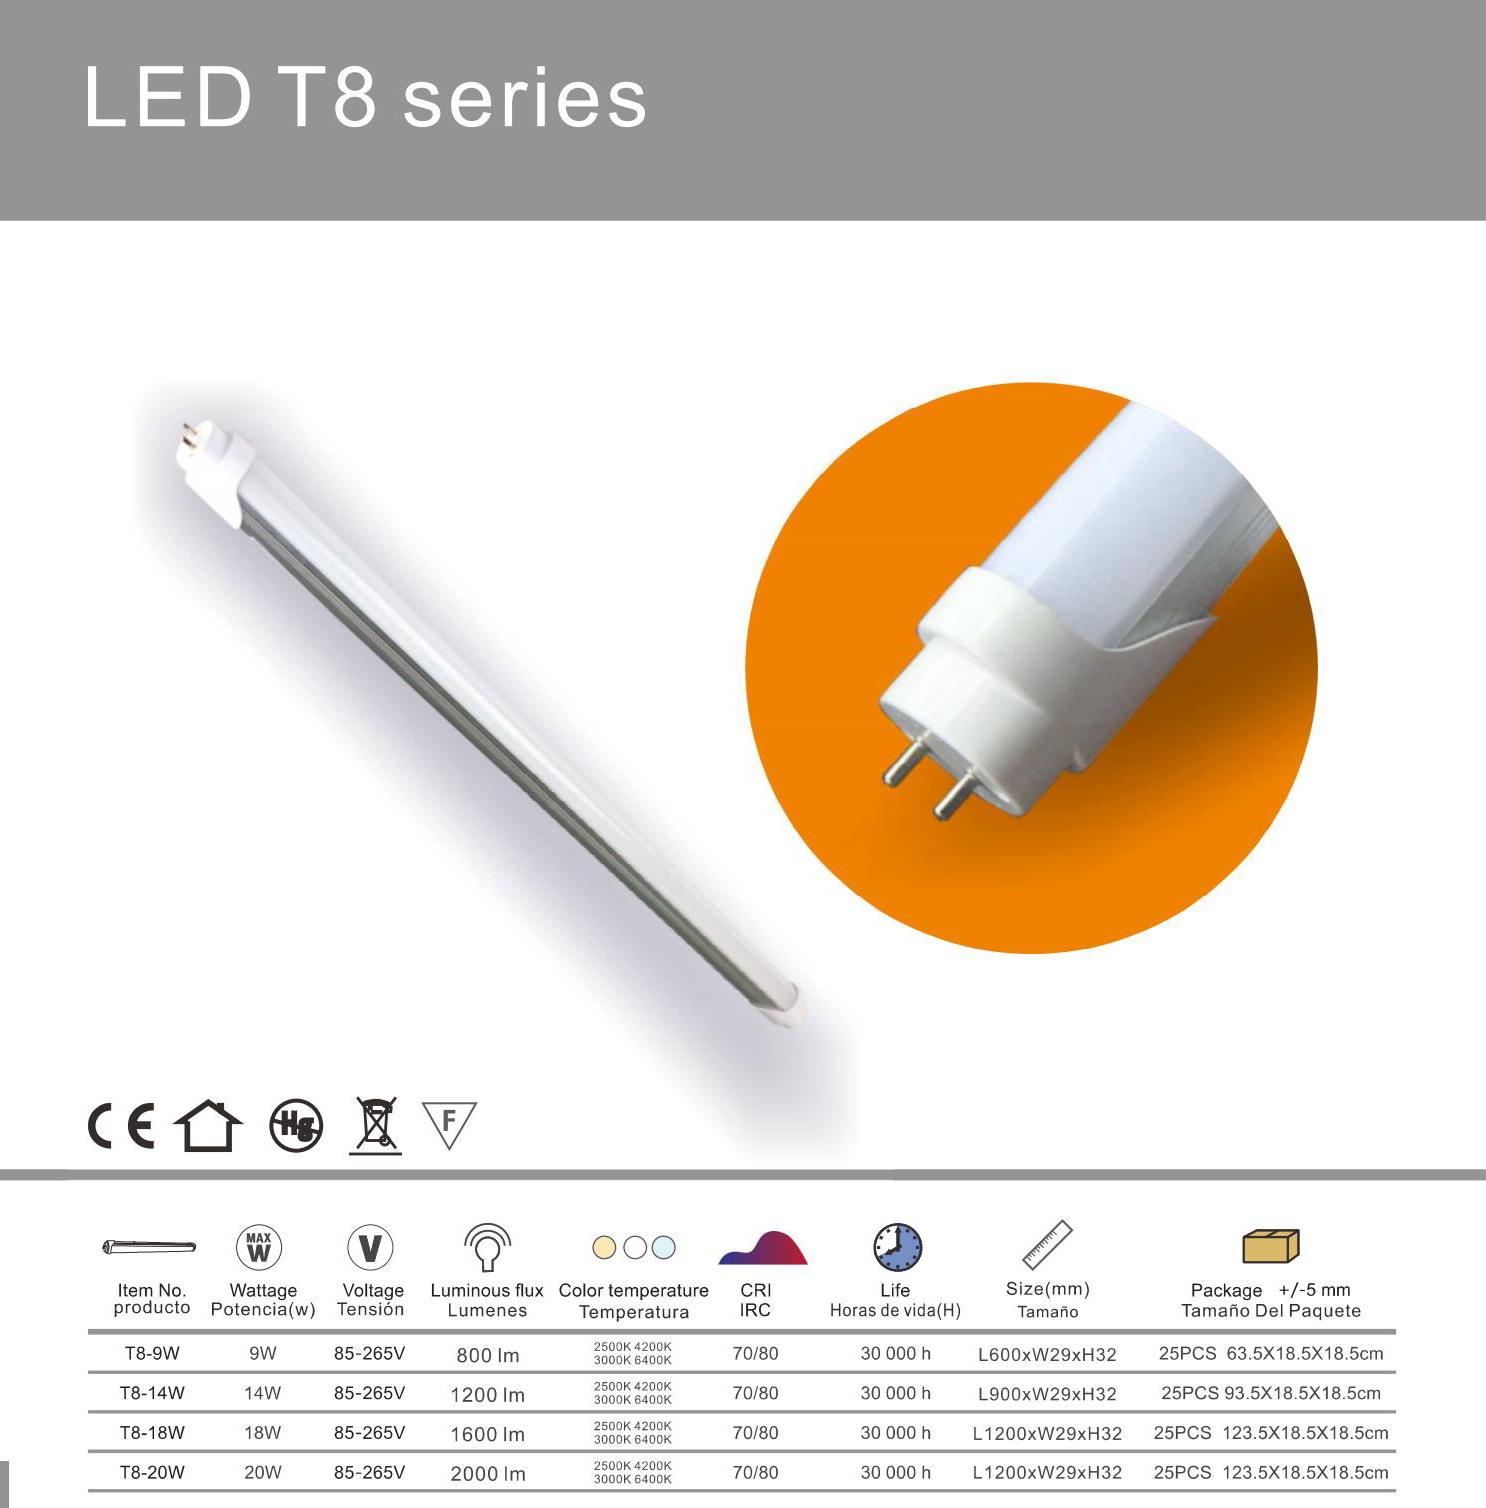 LED T8 series